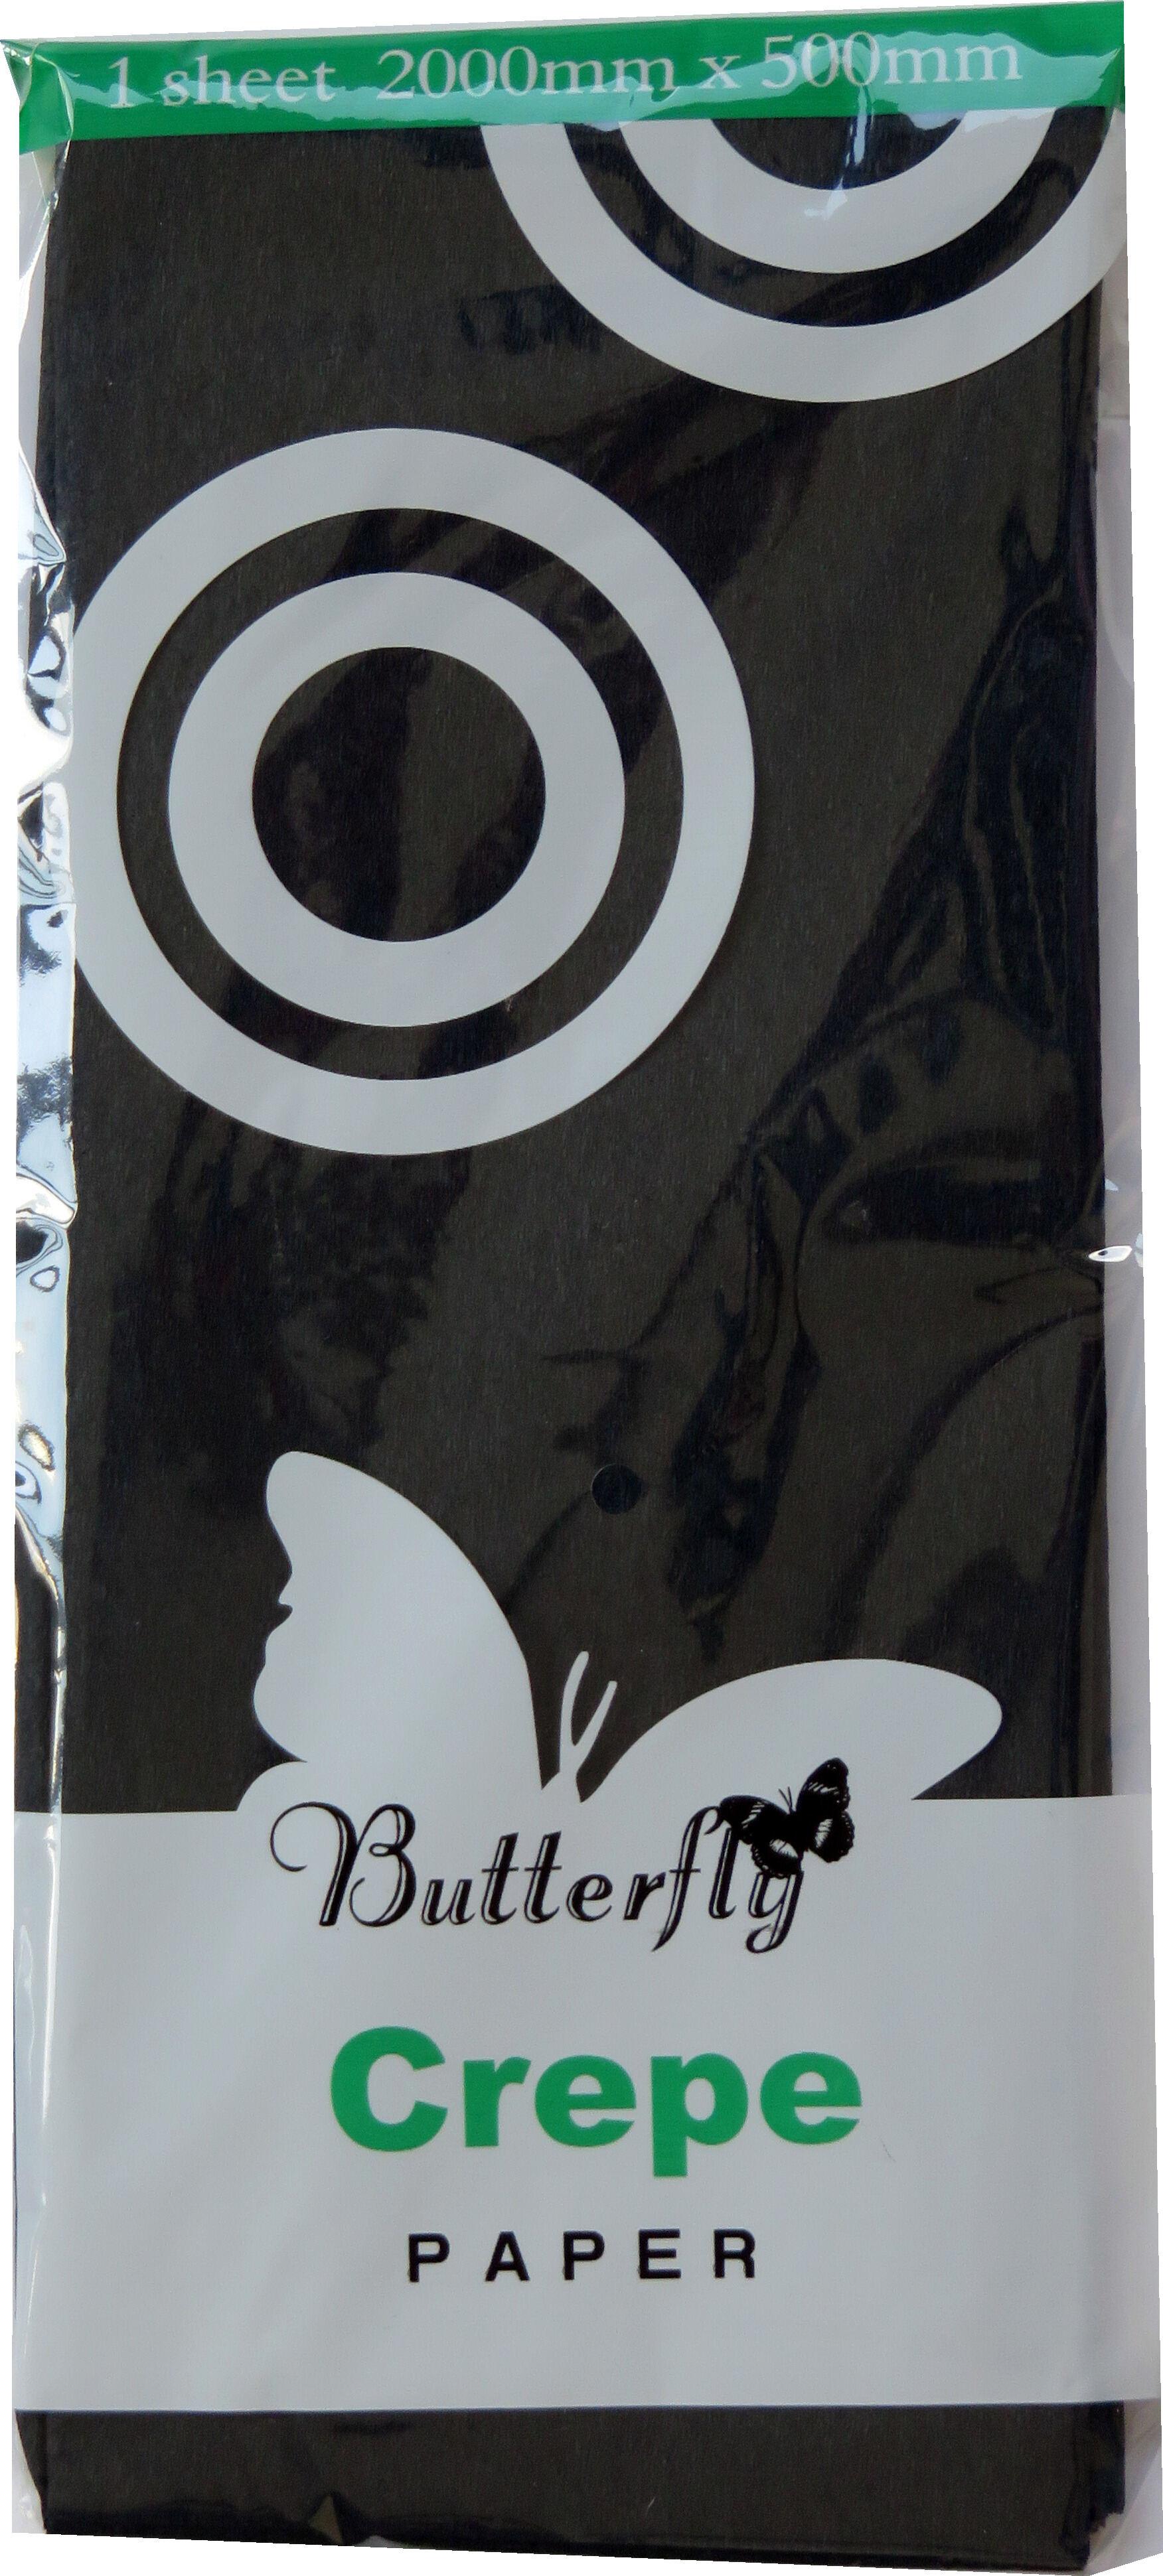 Crepe Paper - 1 Sheet (2m x 500mm) Black